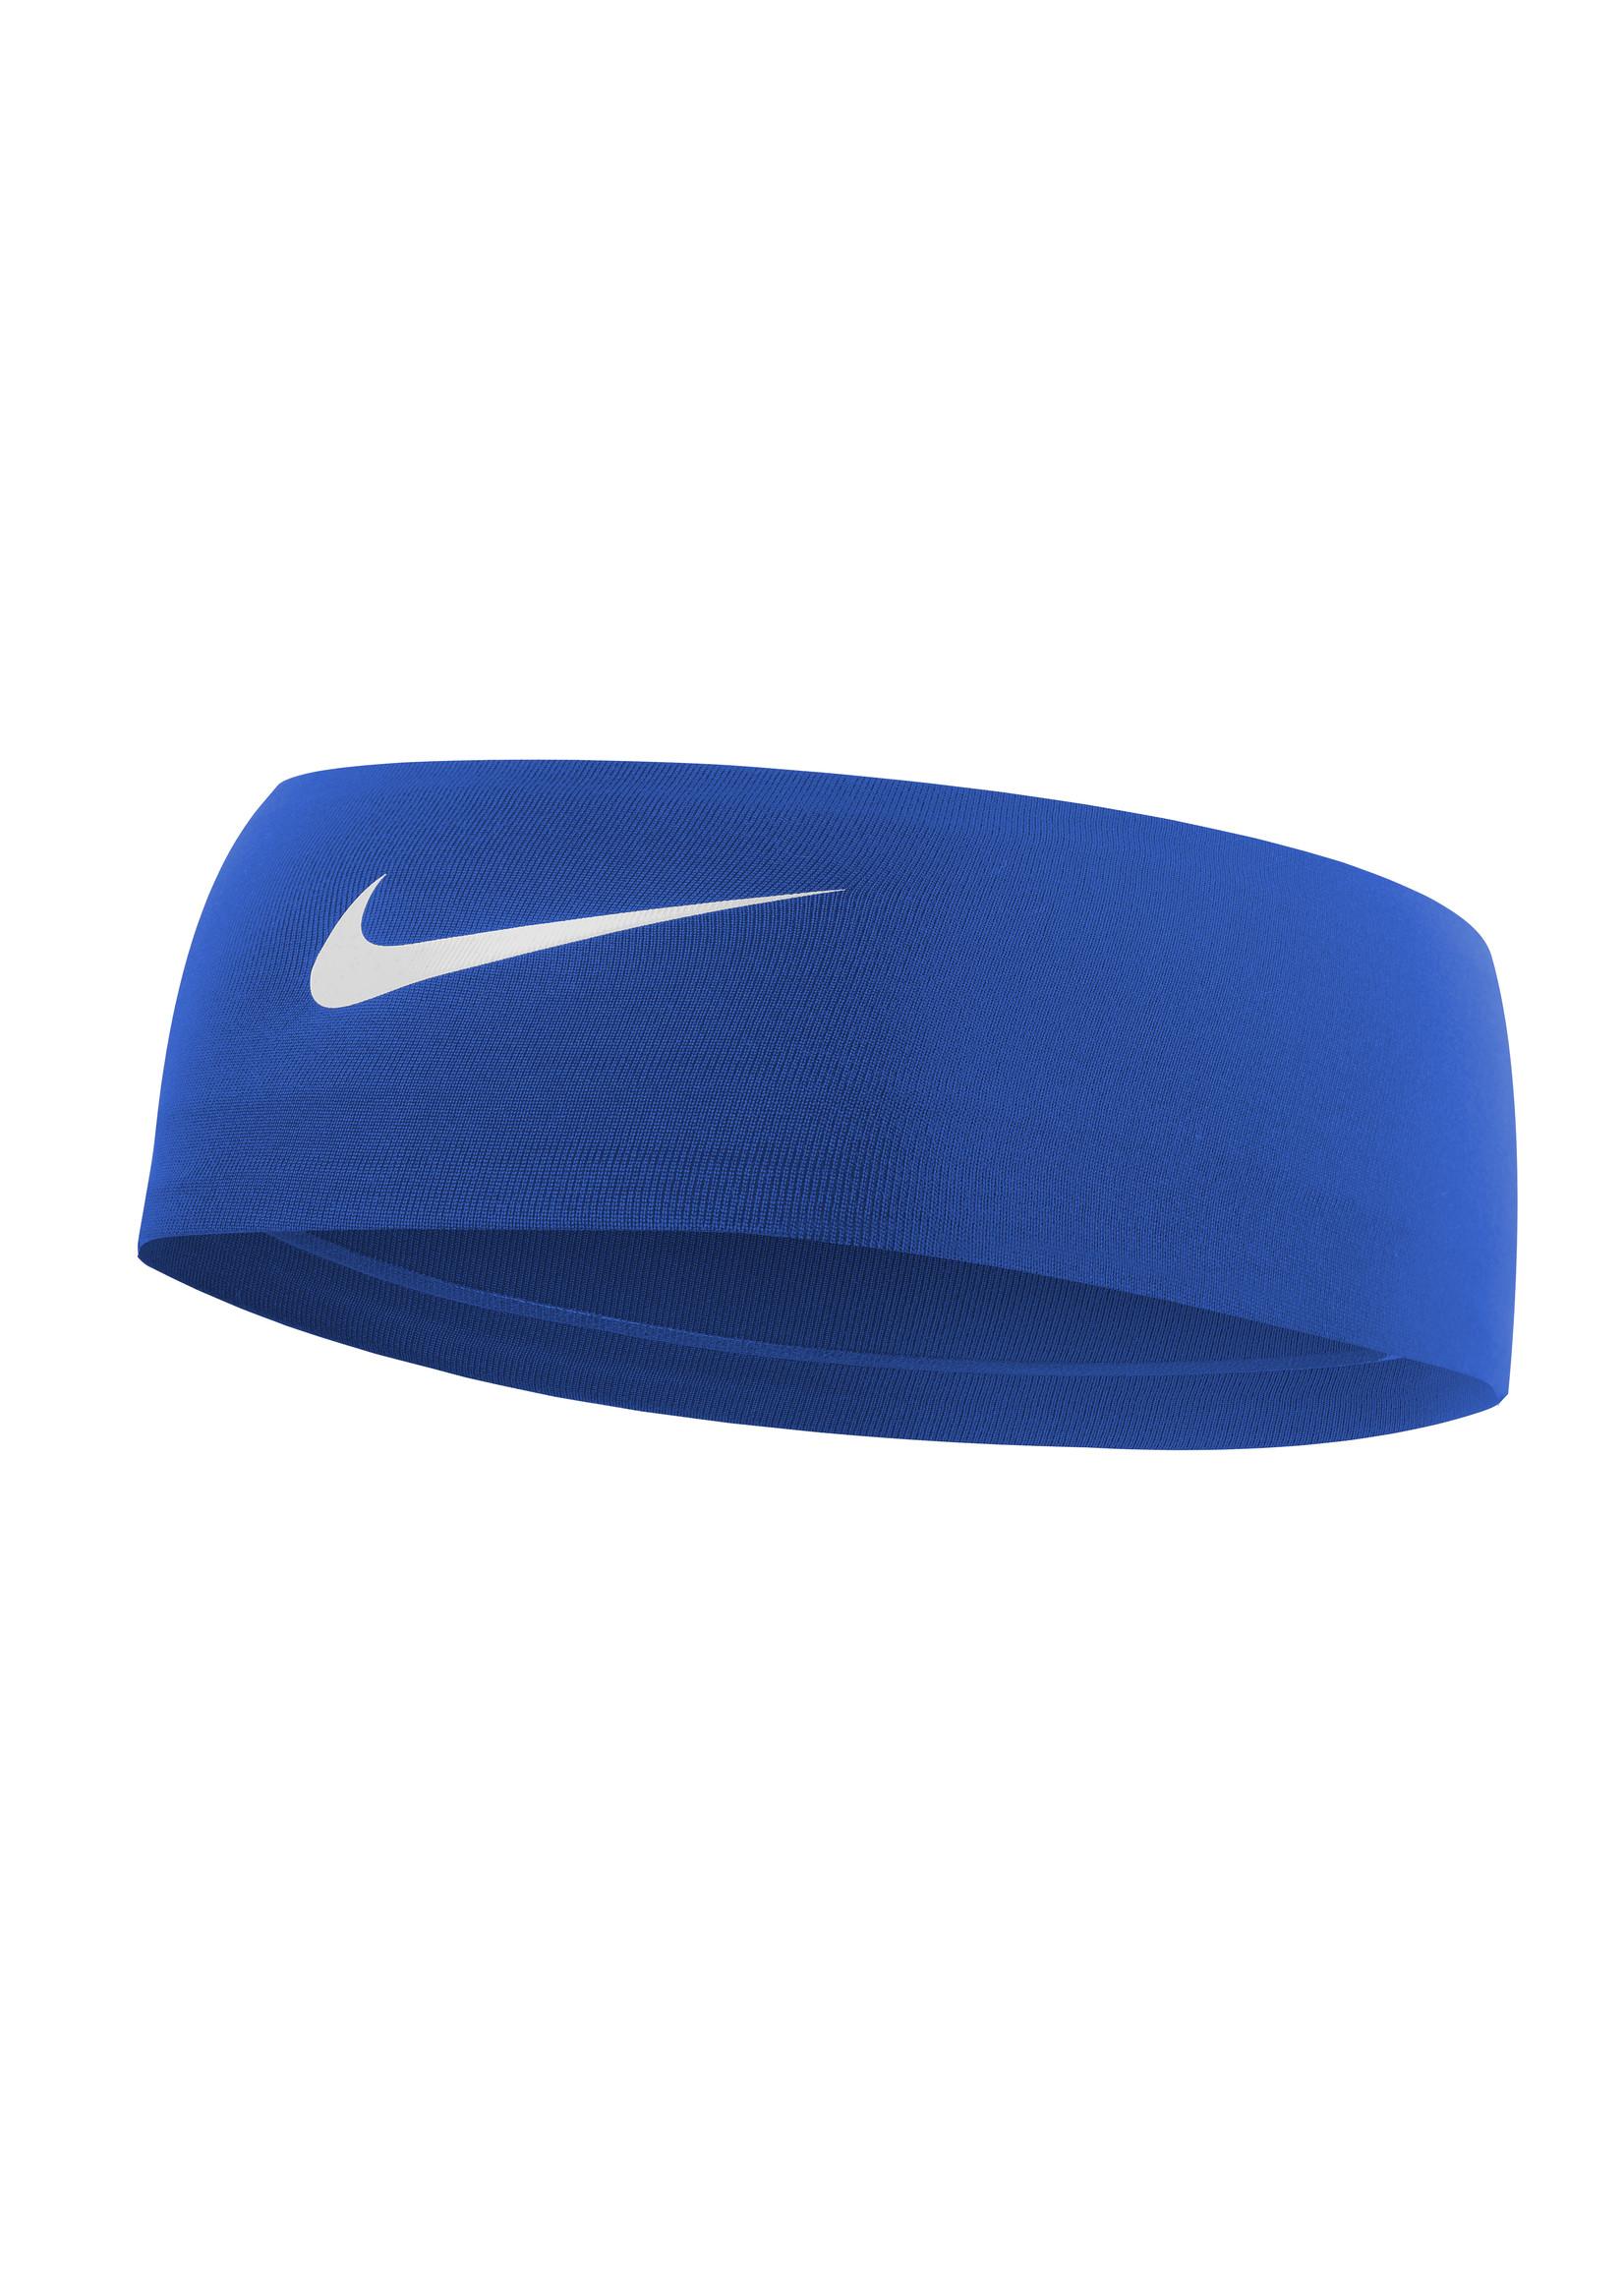 Nike Fury Headband 2.0 Royal/White